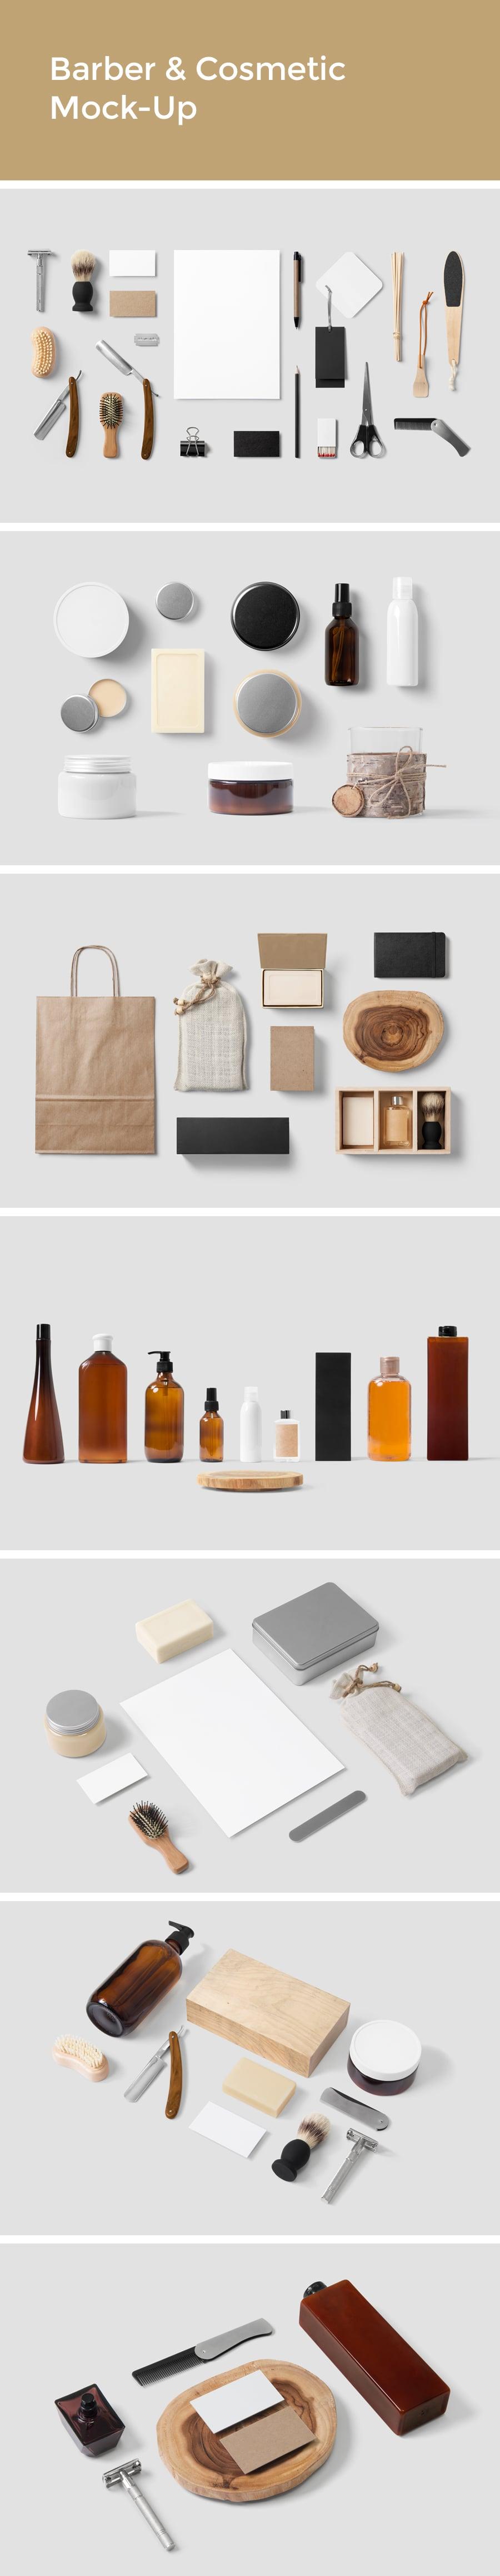 Apparel & Cosmetic Mockup Bundle